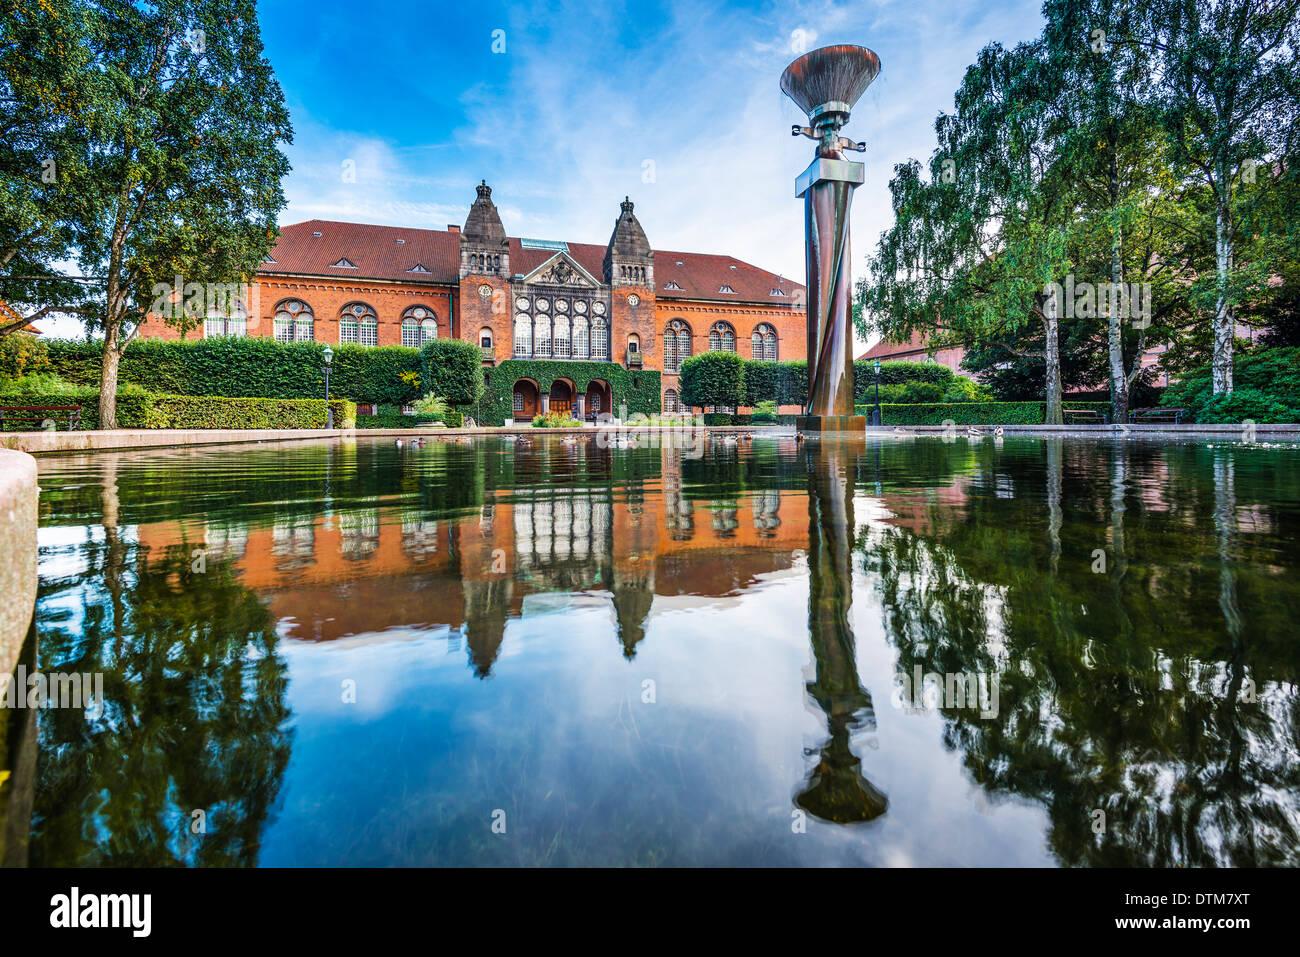 Dänisches Jüdisches Museum in Kopenhagen, Dänemark. Stockbild